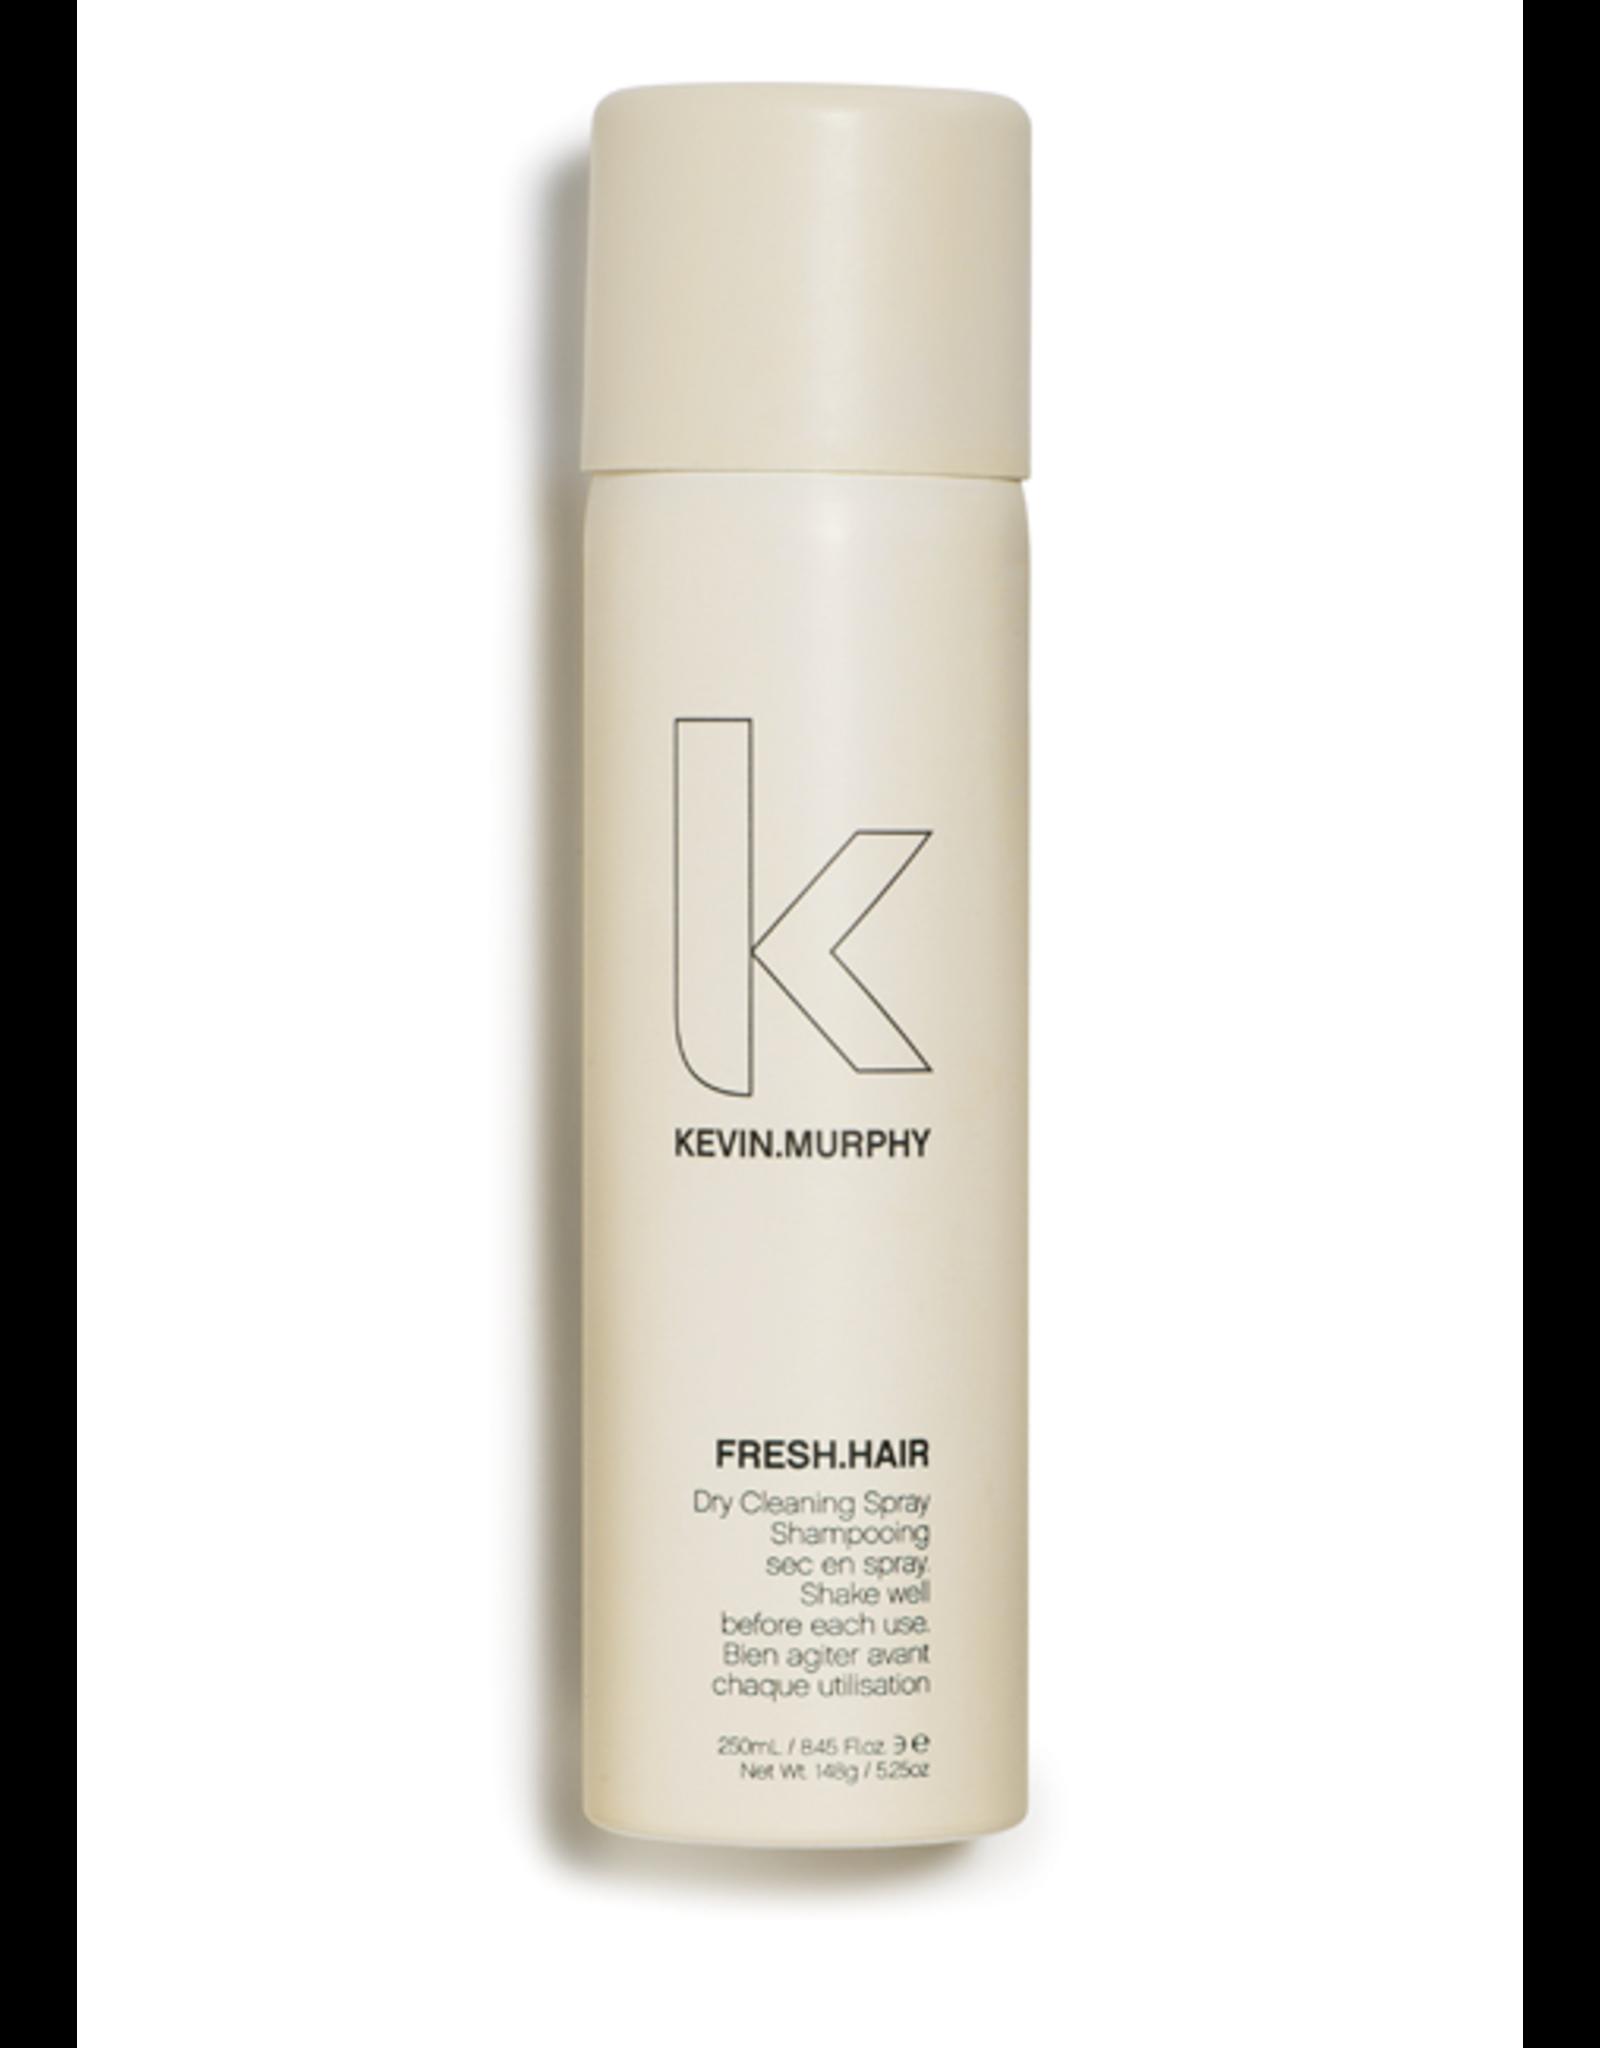 KEVIN.MURPHY Fresh.Hair (57 ml)